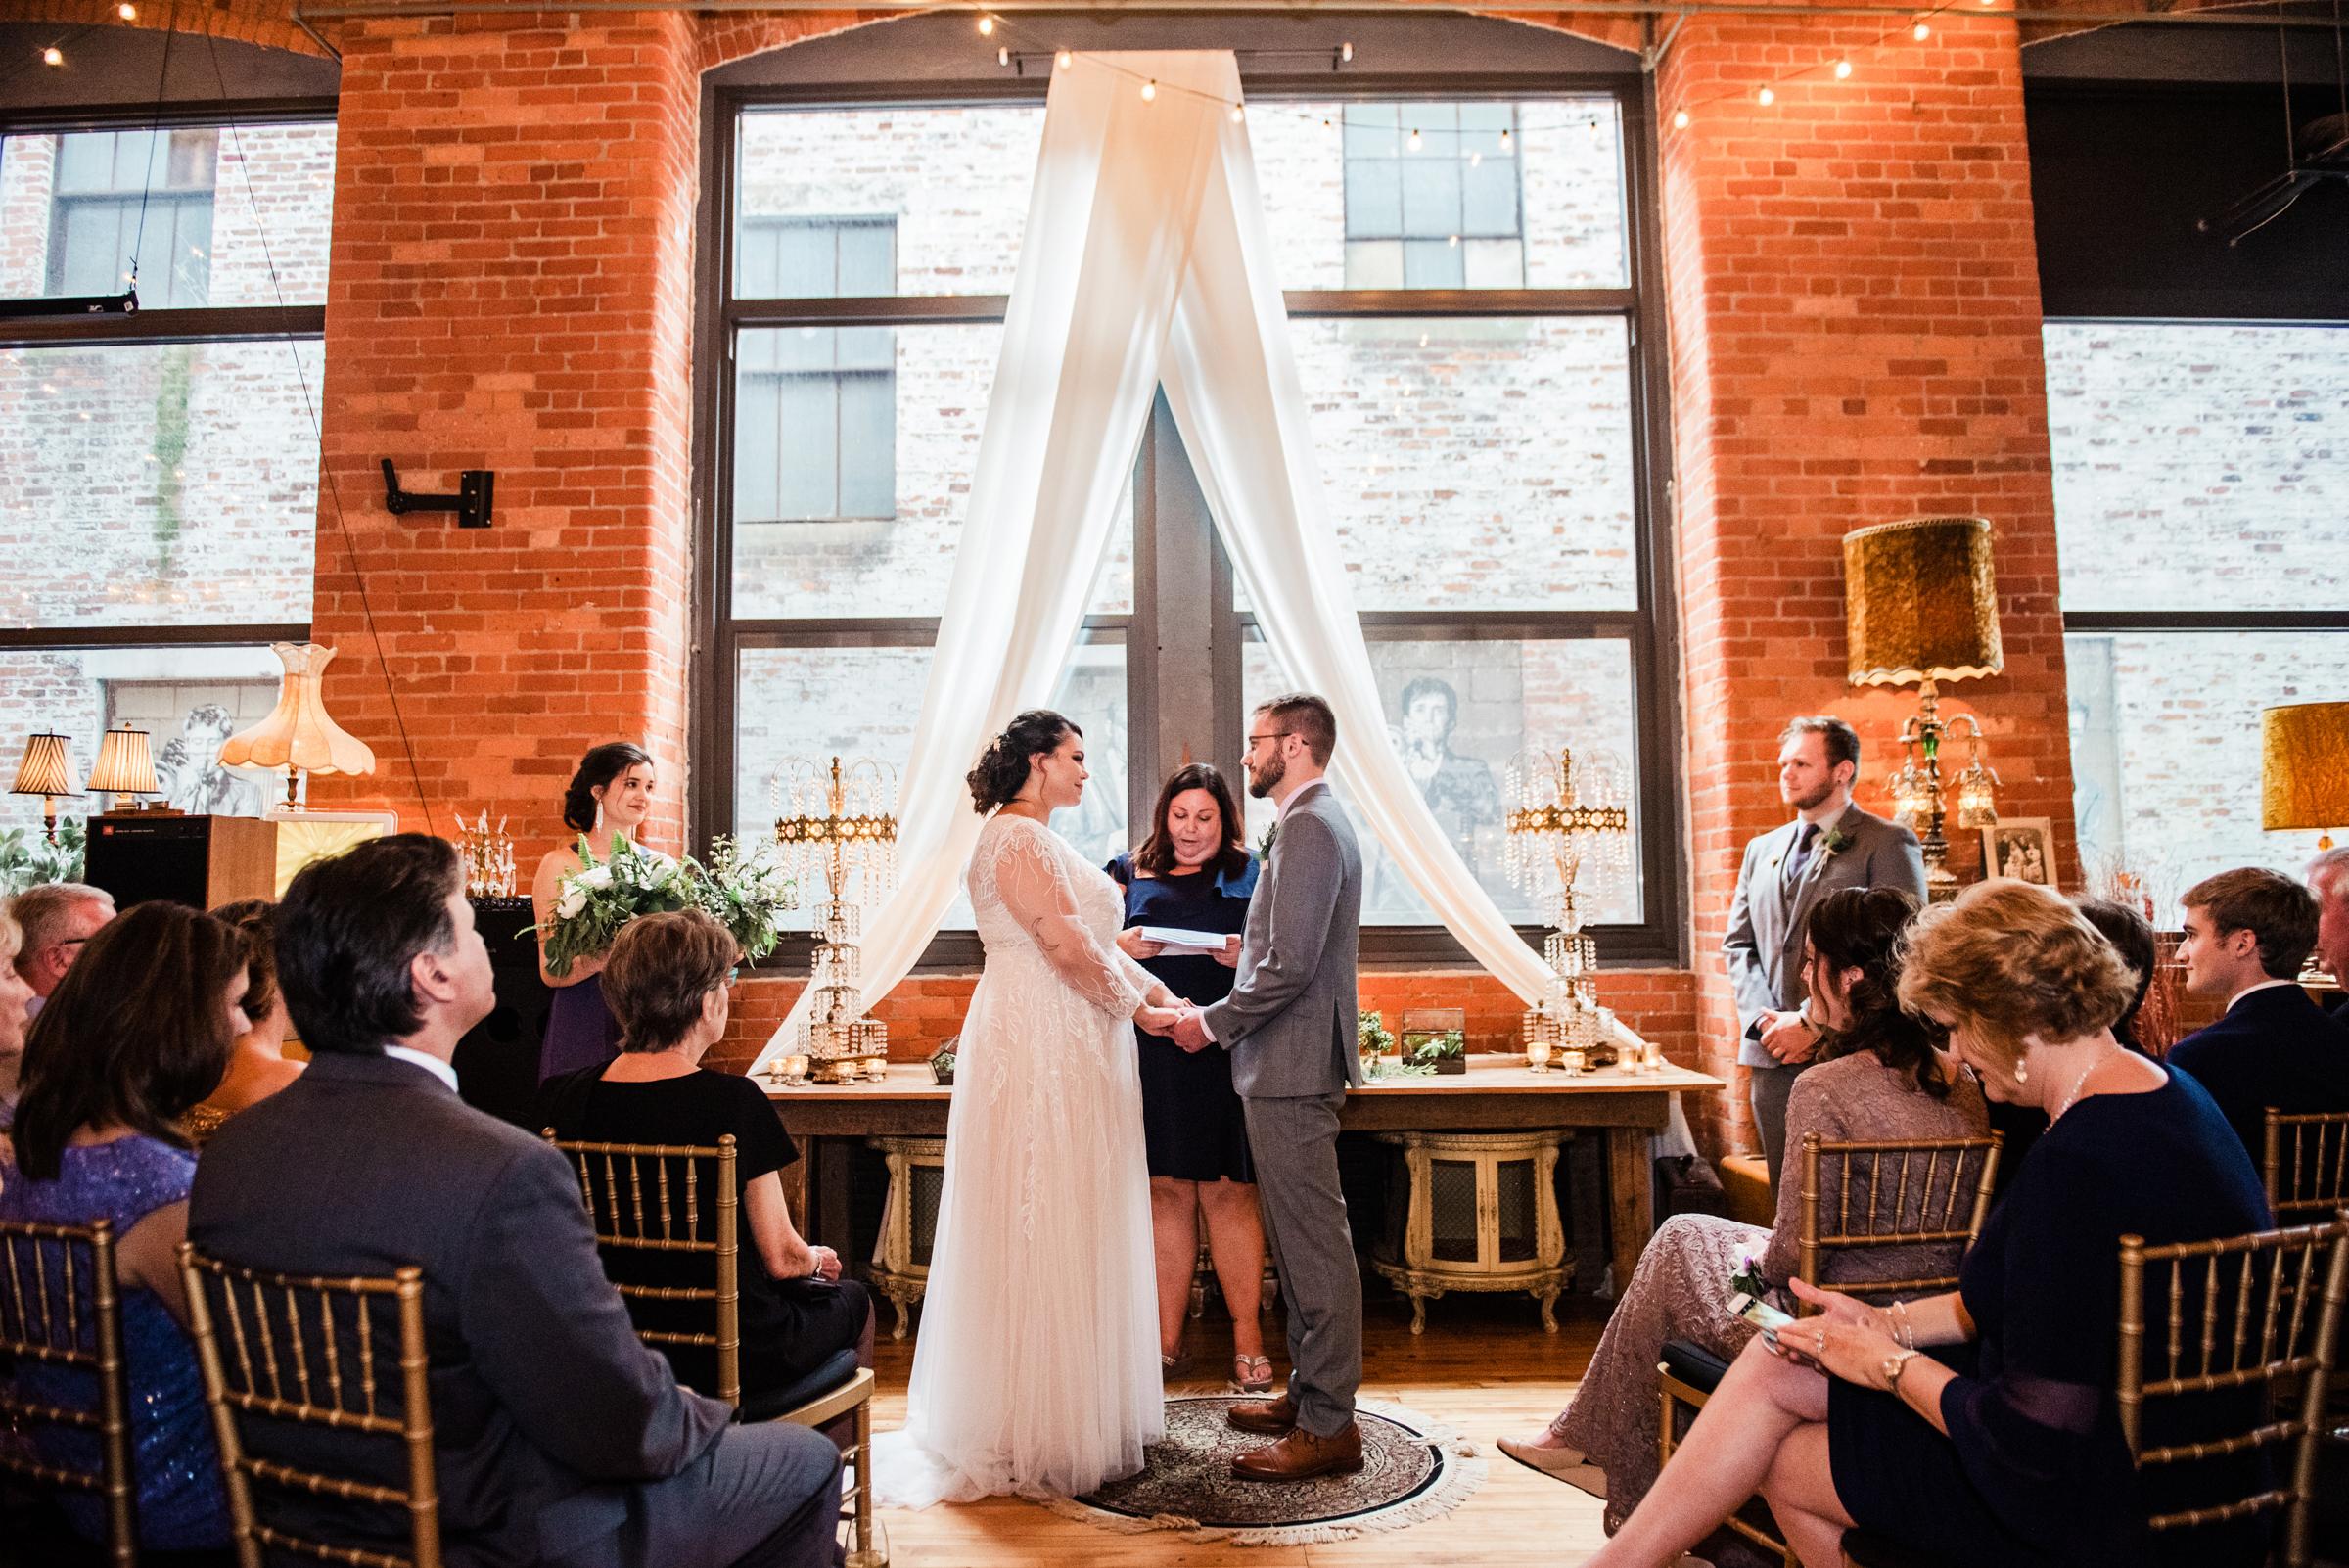 Studio_180_Lamberton_Conservatory_Rochester_Wedding_JILL_STUDIO_Rochester_NY_Photographer_DSC_8914.jpg